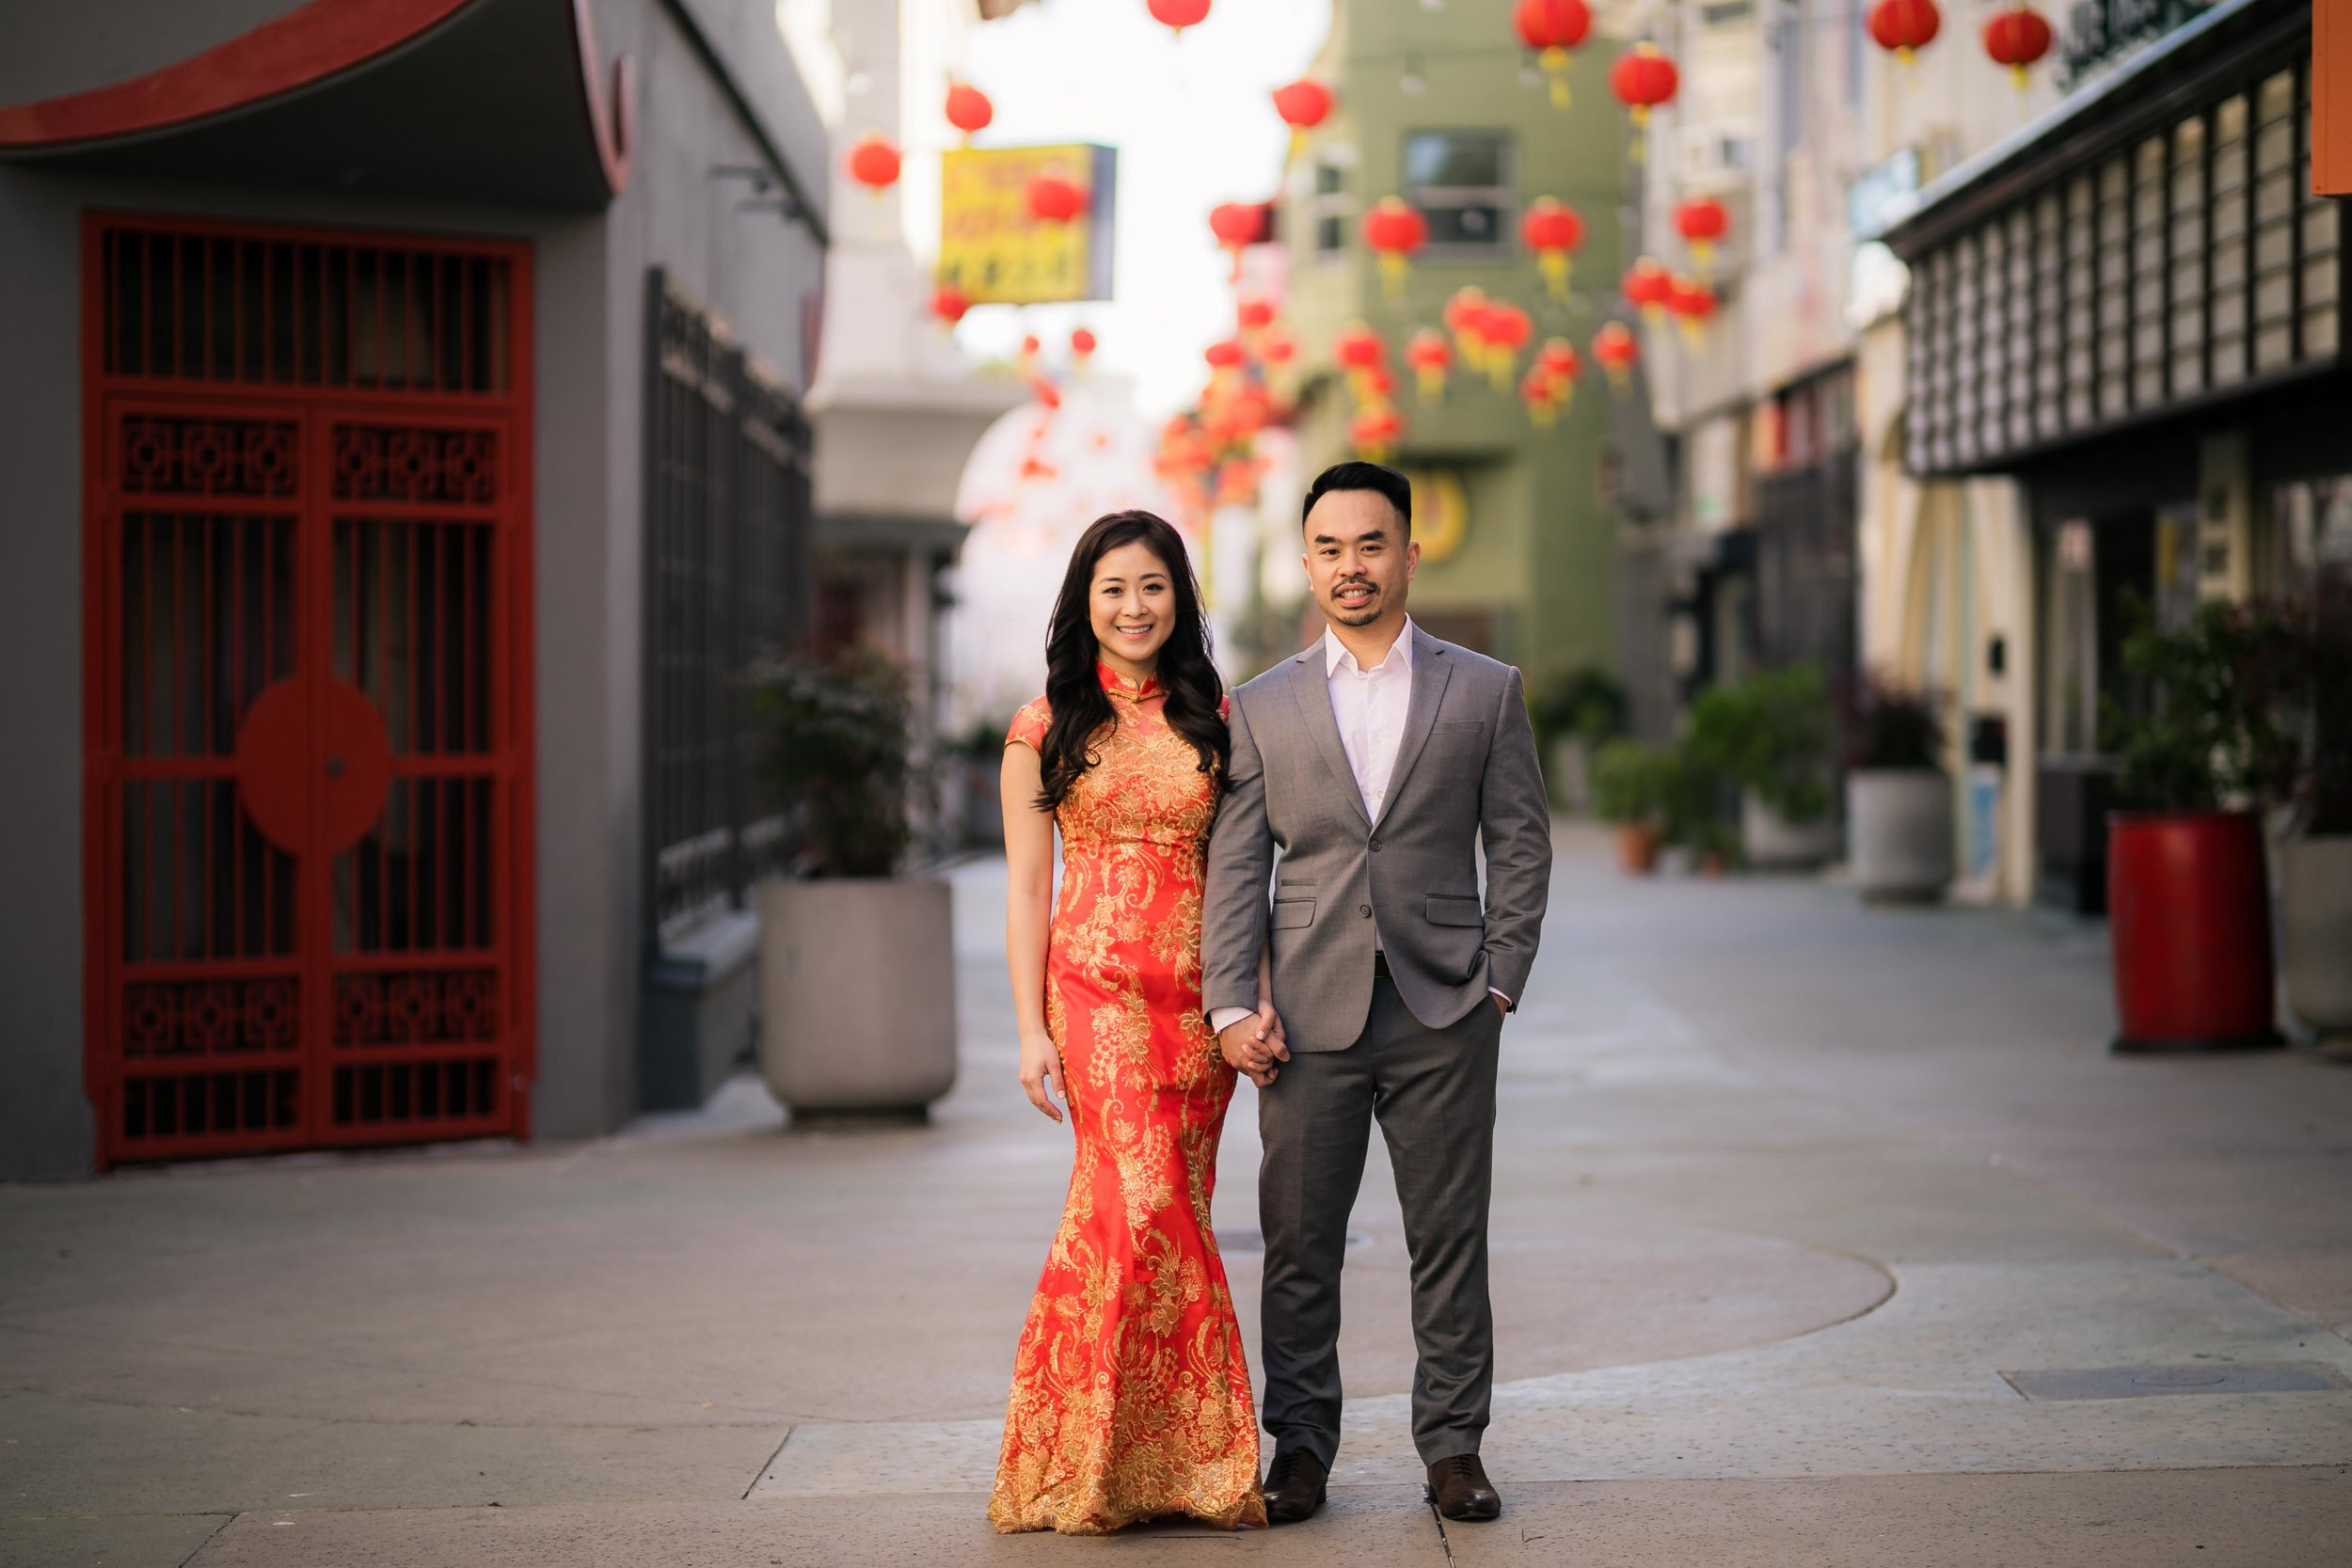 chinese_los_angeles_california_wedding_joshuachun_photography-2.JPG